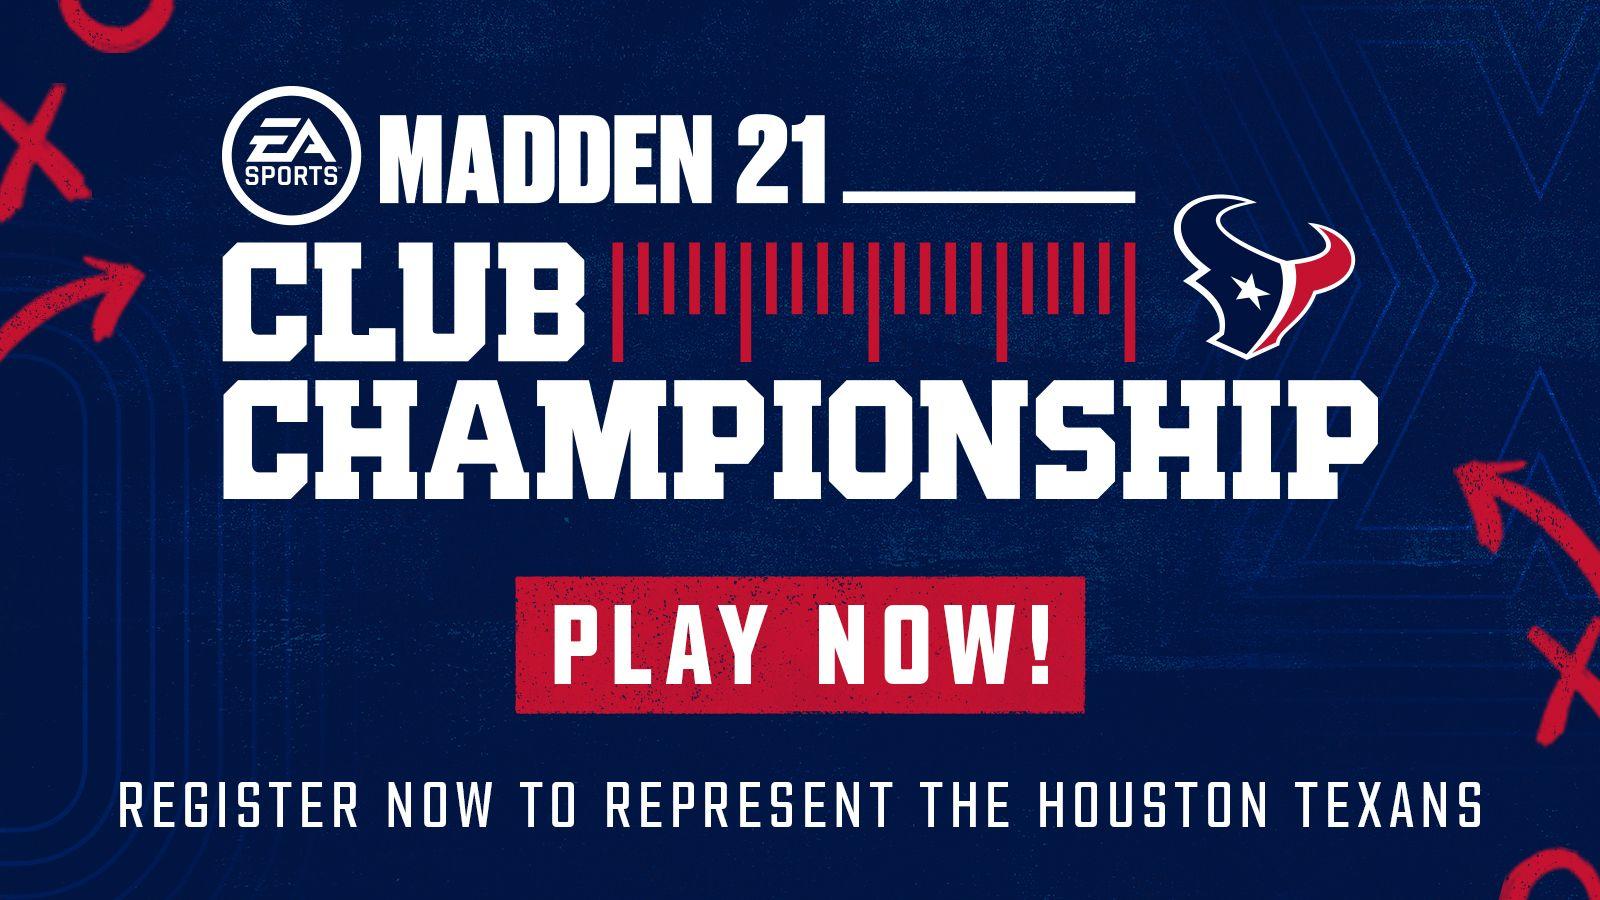 Madden 21 Club Championship.